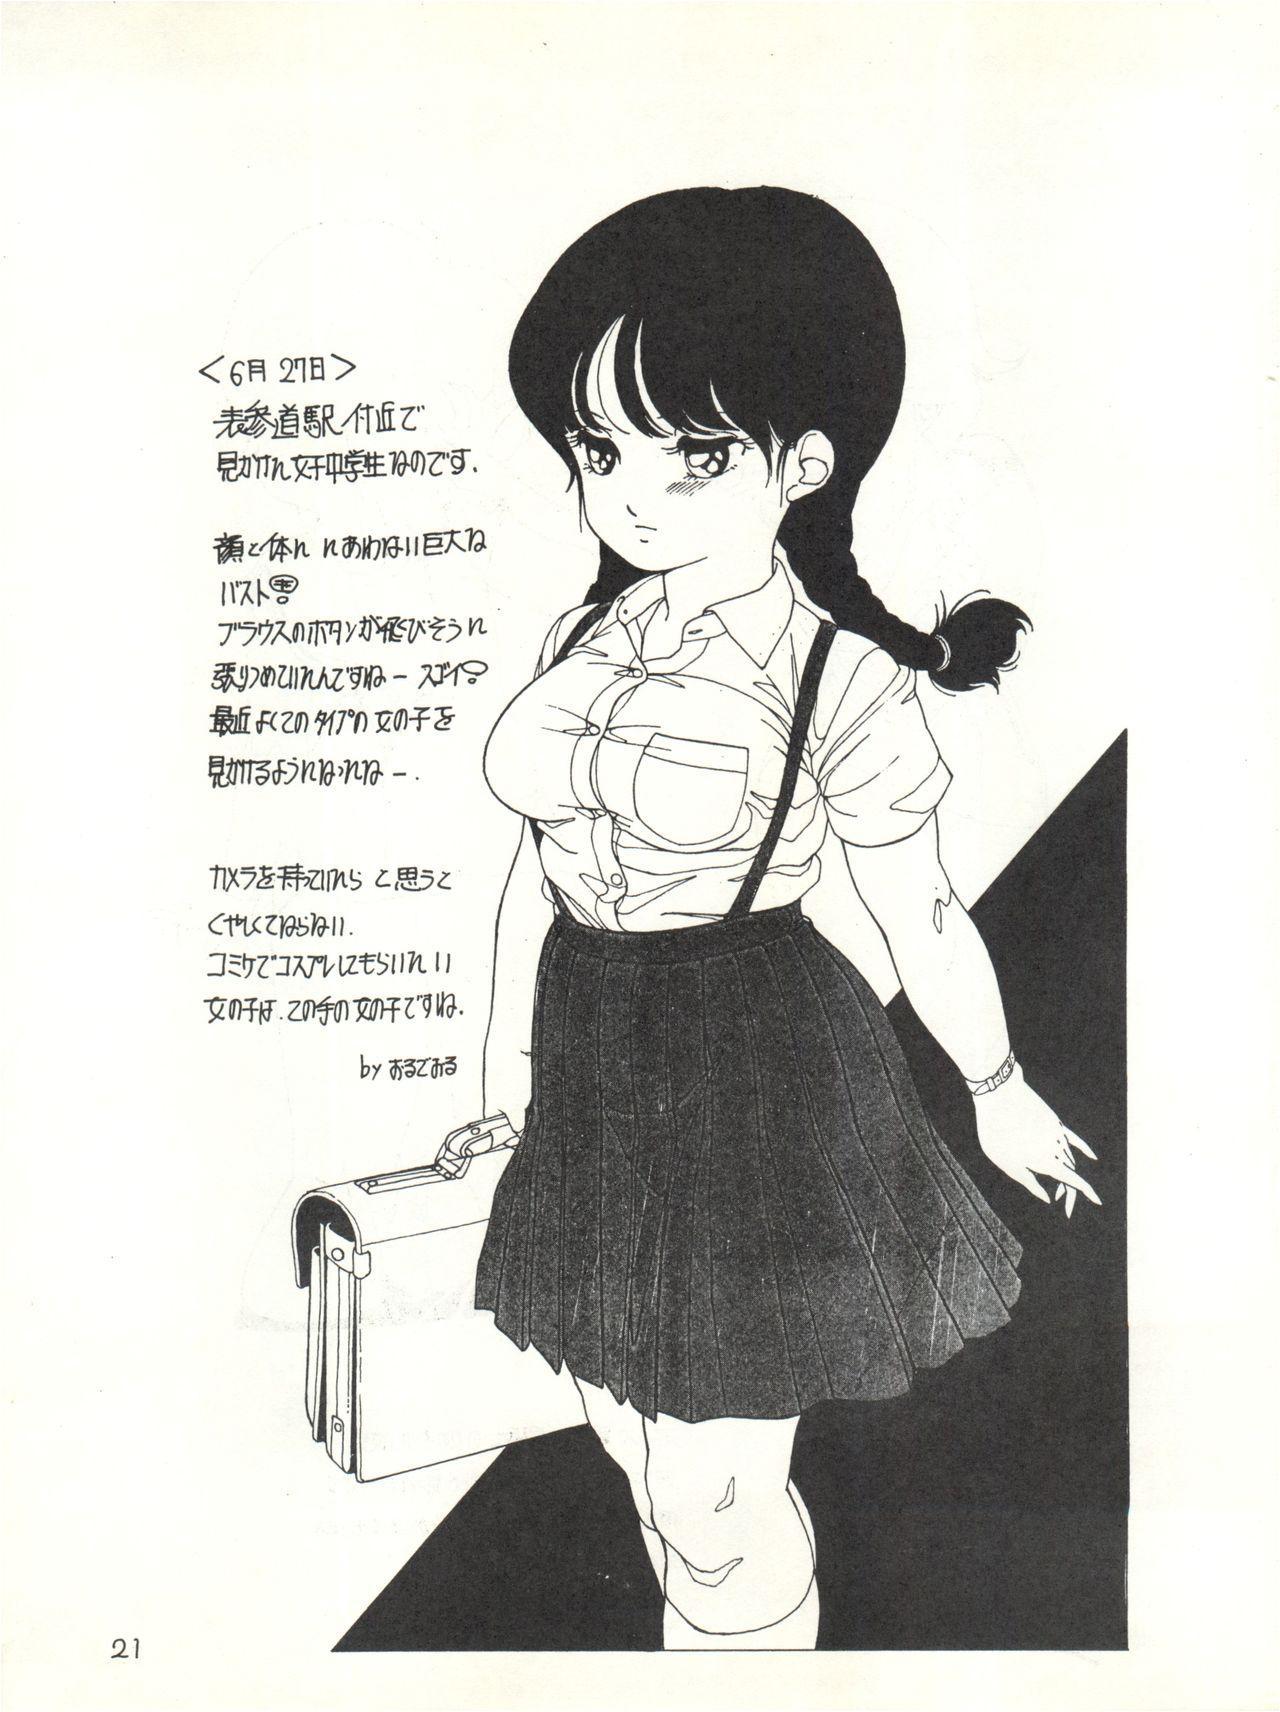 Soldier Lady vol. 8 22